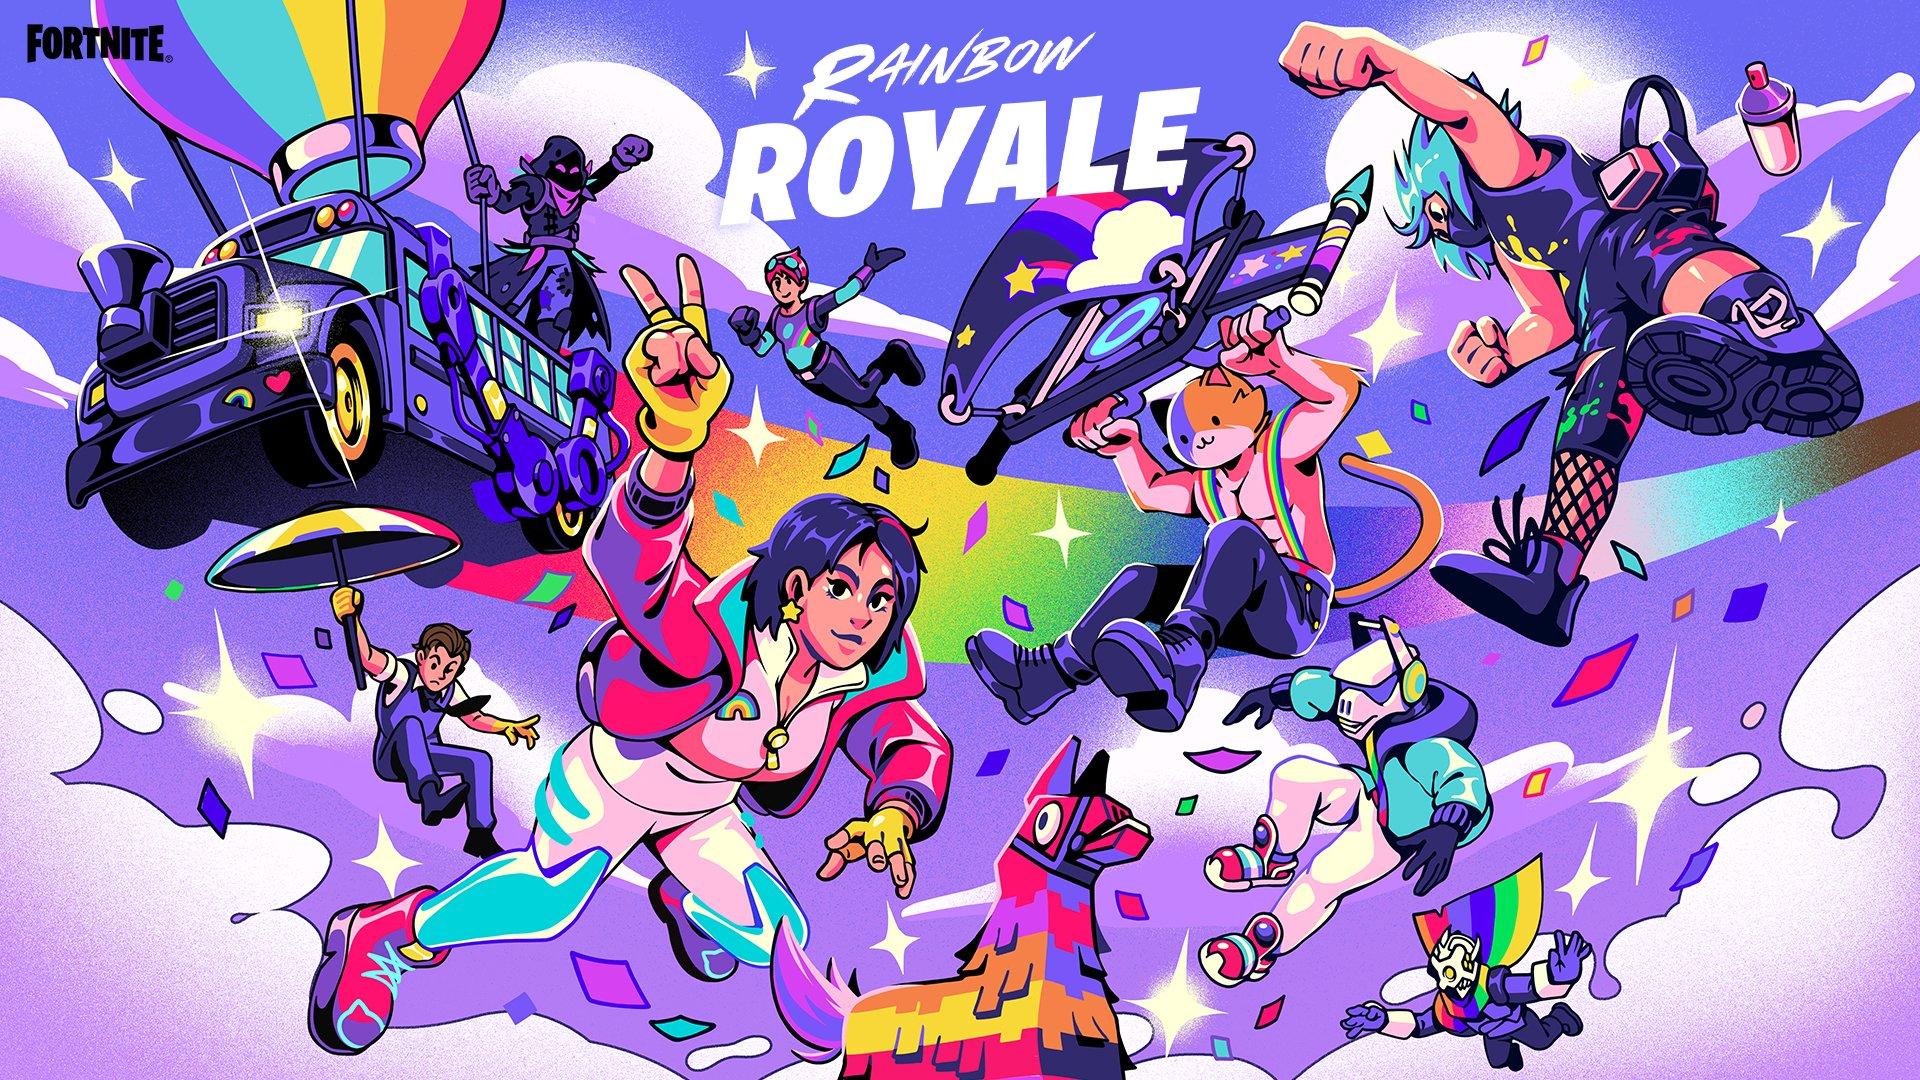 fortnite-rainbow-royale1